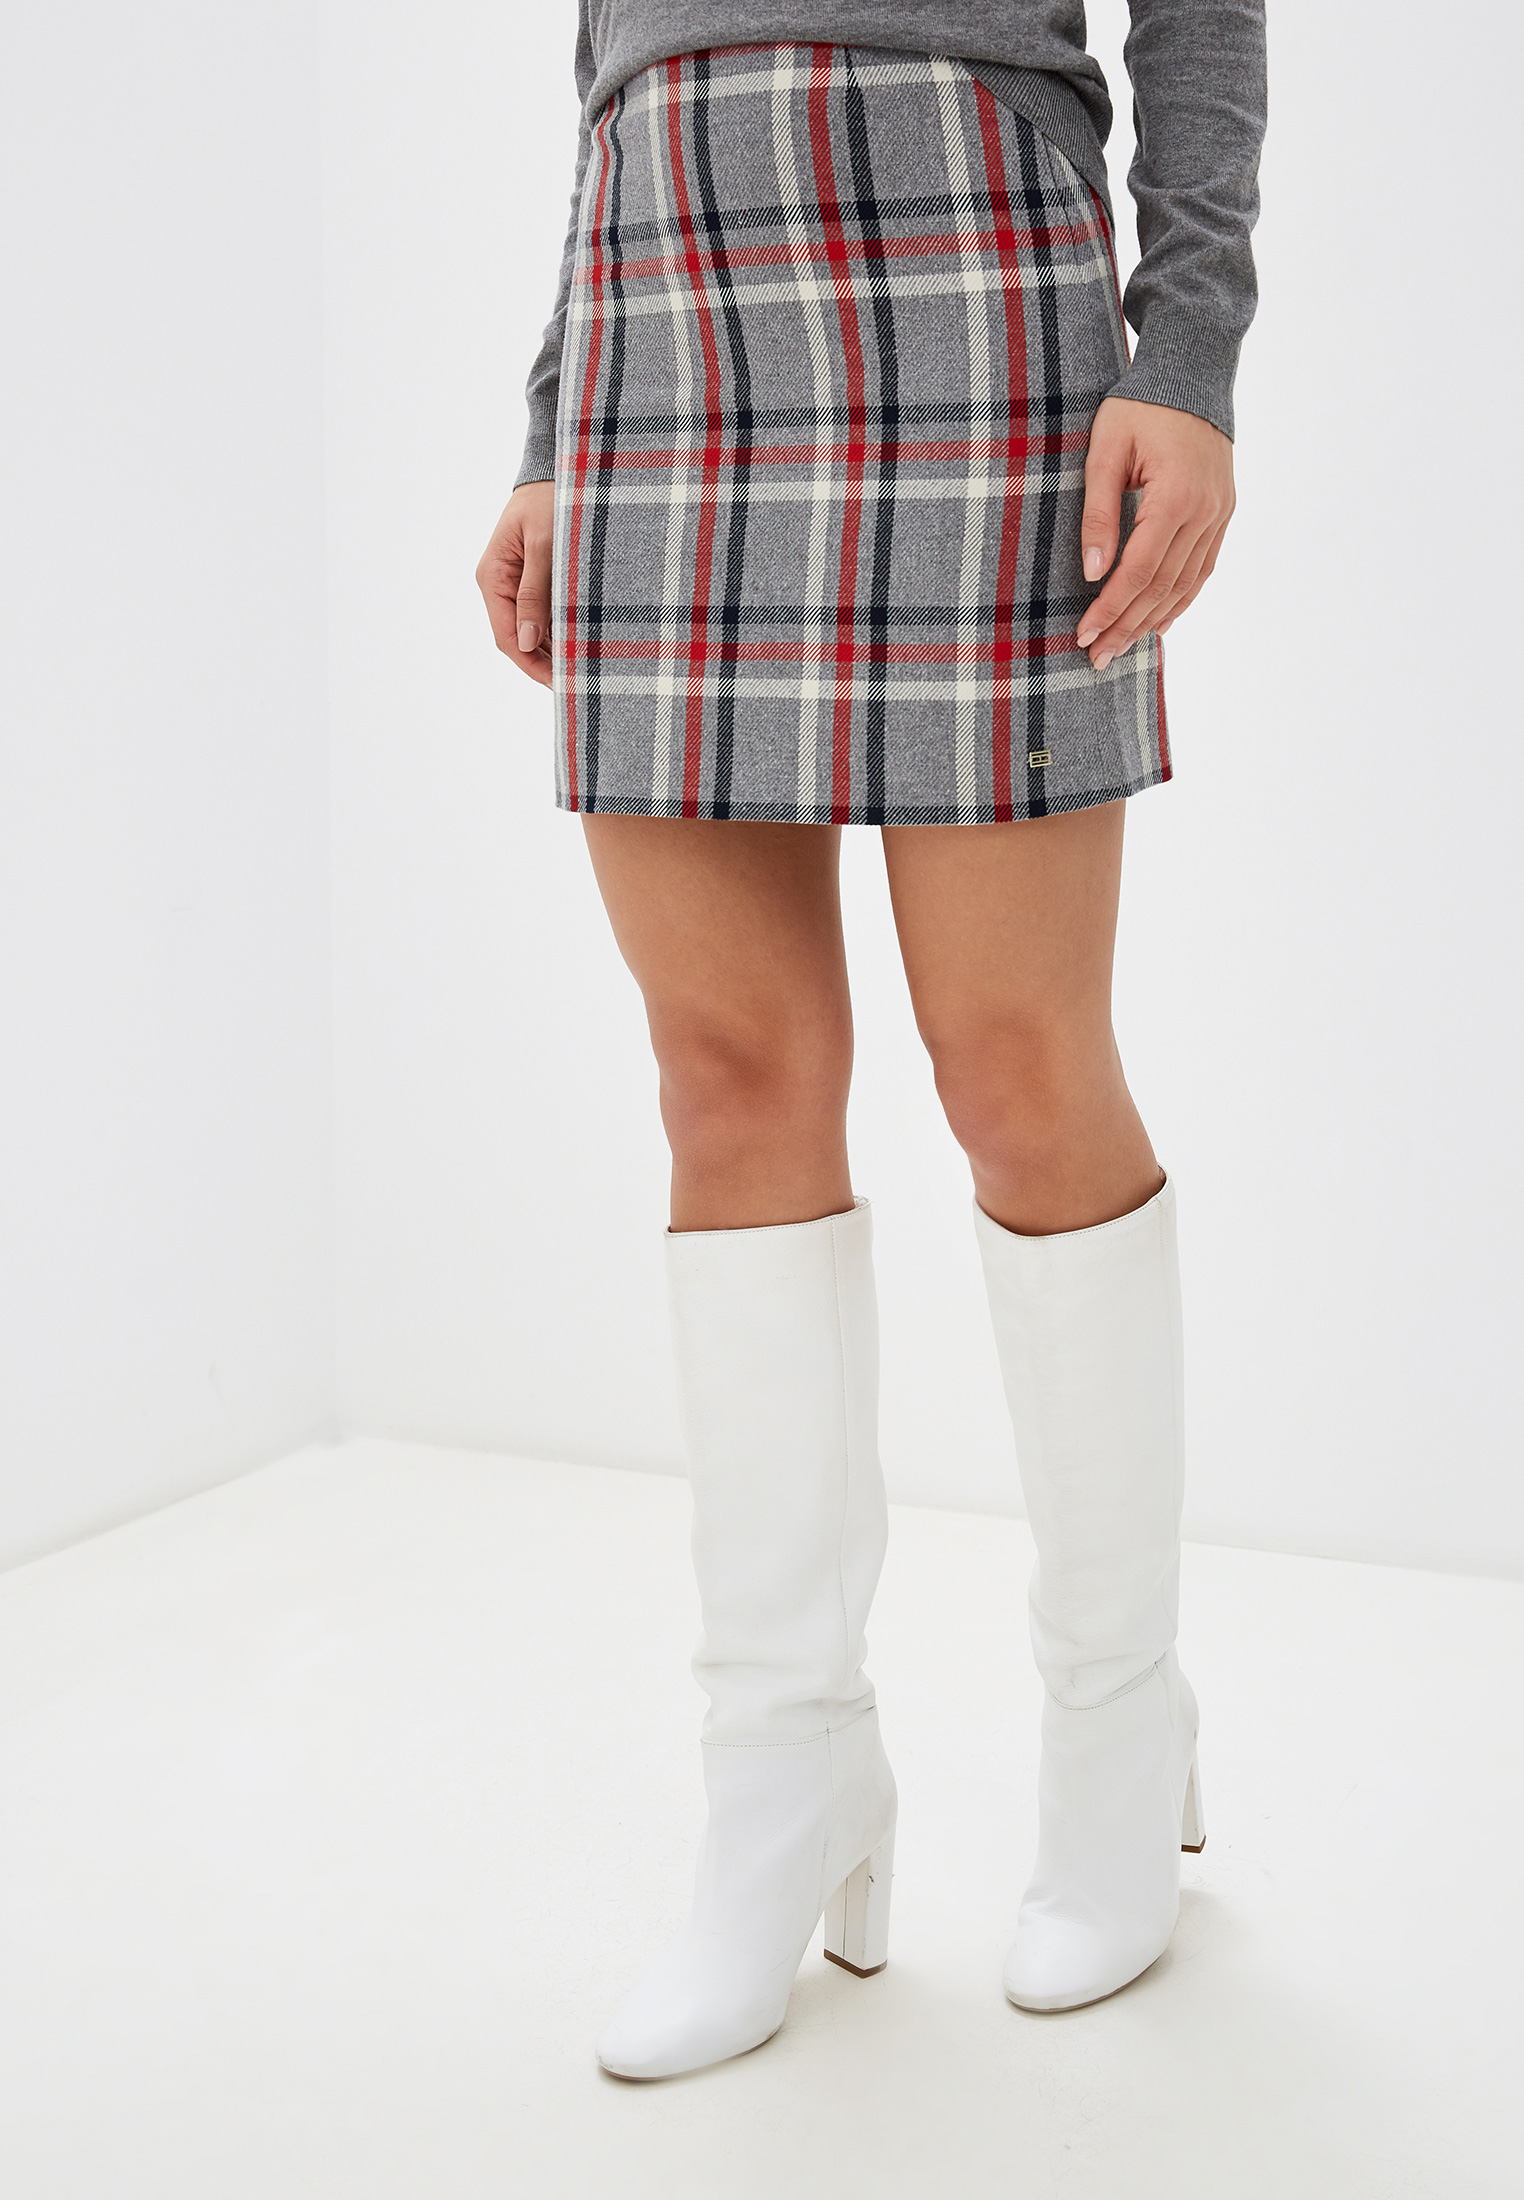 Прямая юбка Tommy Hilfiger (Томми Хилфигер) WW0WW25898